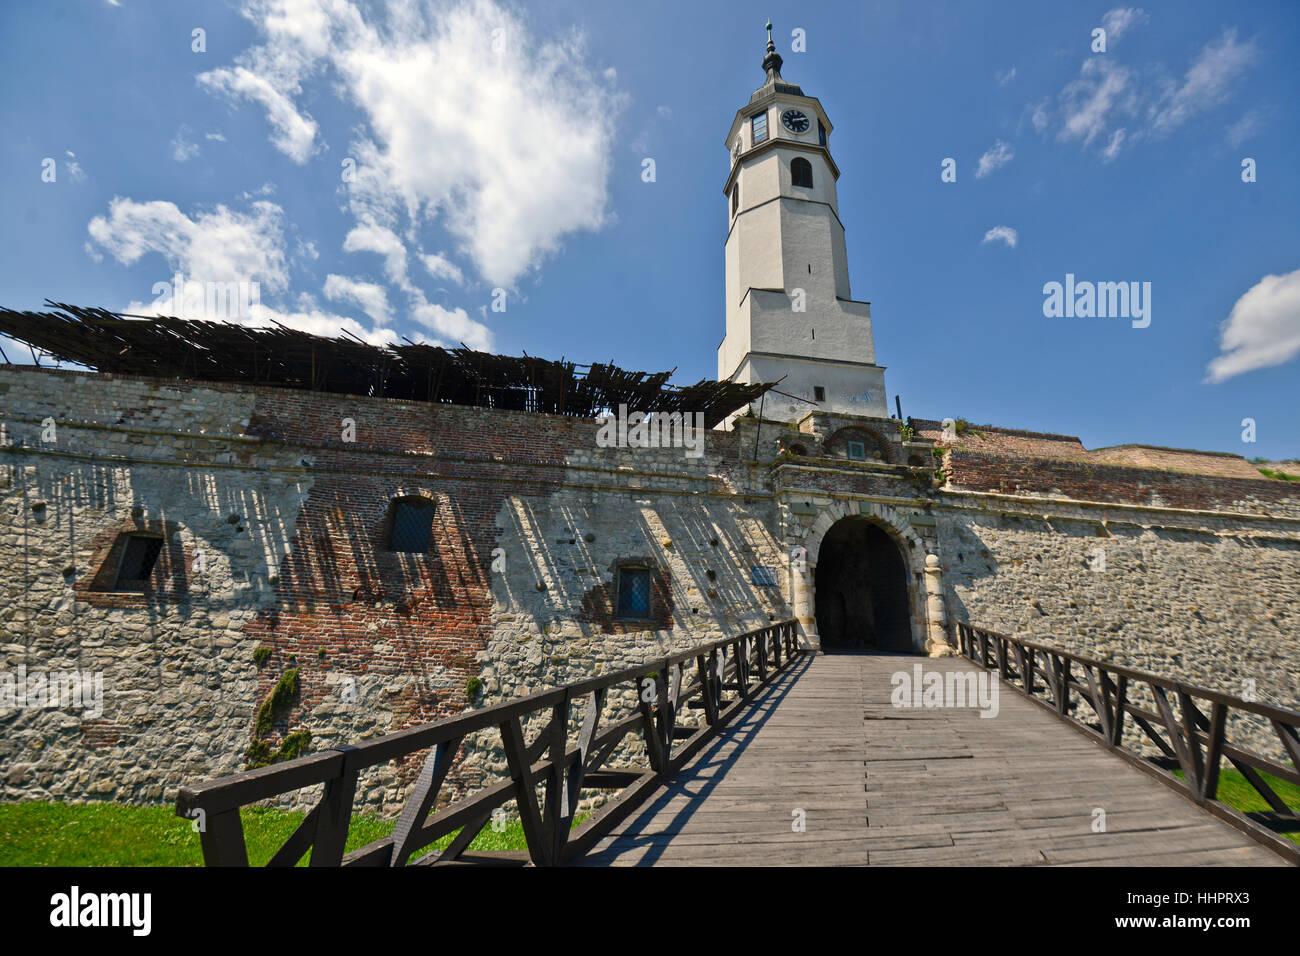 Belgrade Fortress, Kalemegdan, Belgrade, Serbia. Lateral entrance - Stock Image